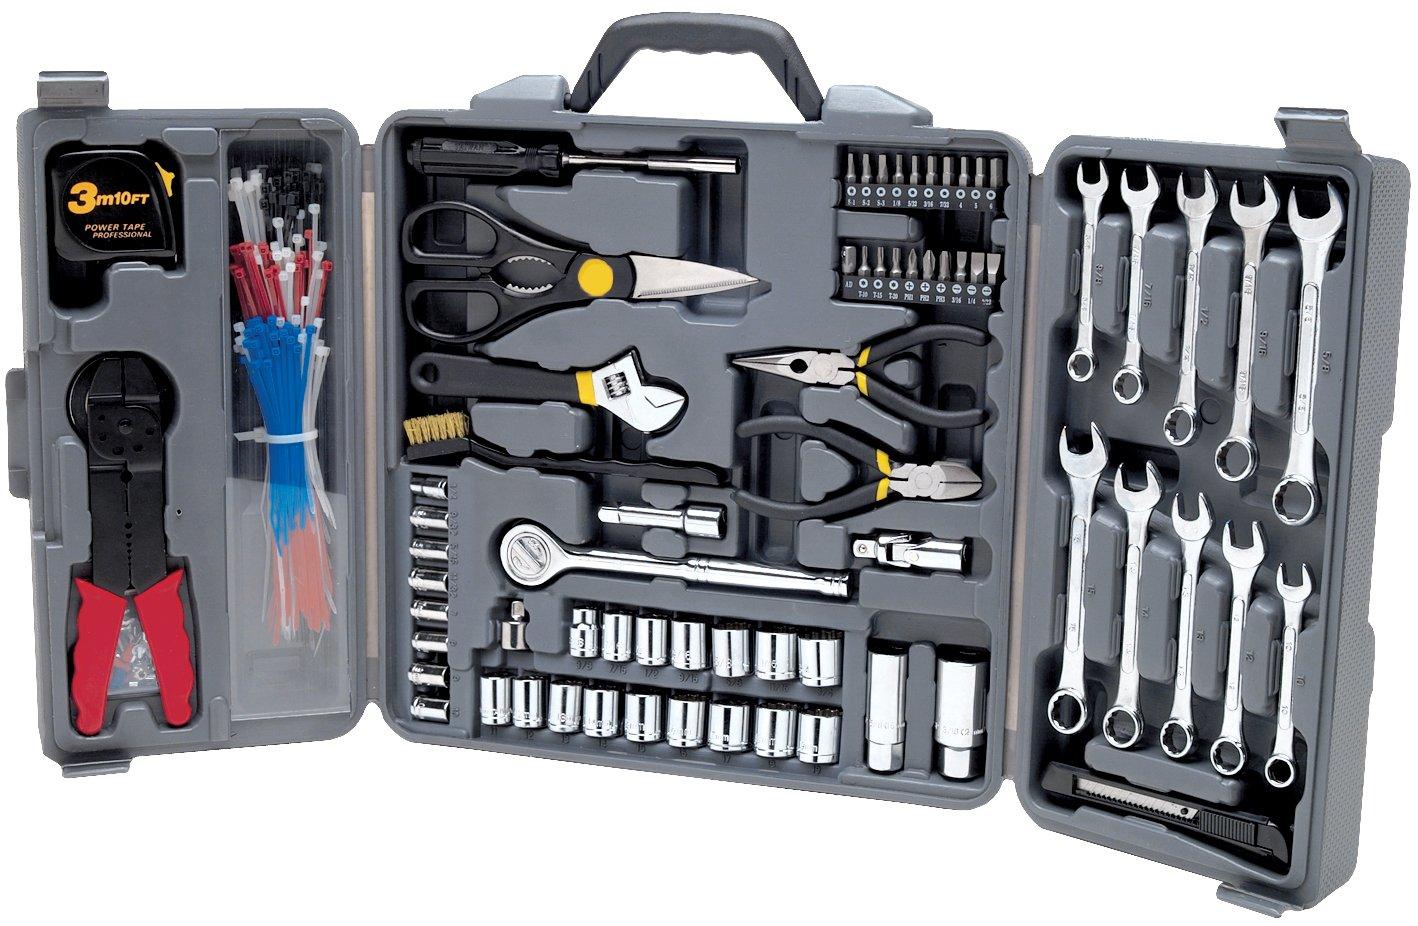 Performance Tool W1519 SAE/Metric 265 Piece Tri-Fold Home & Auto Tool Set (1/4'' & 3/8'' Drive)